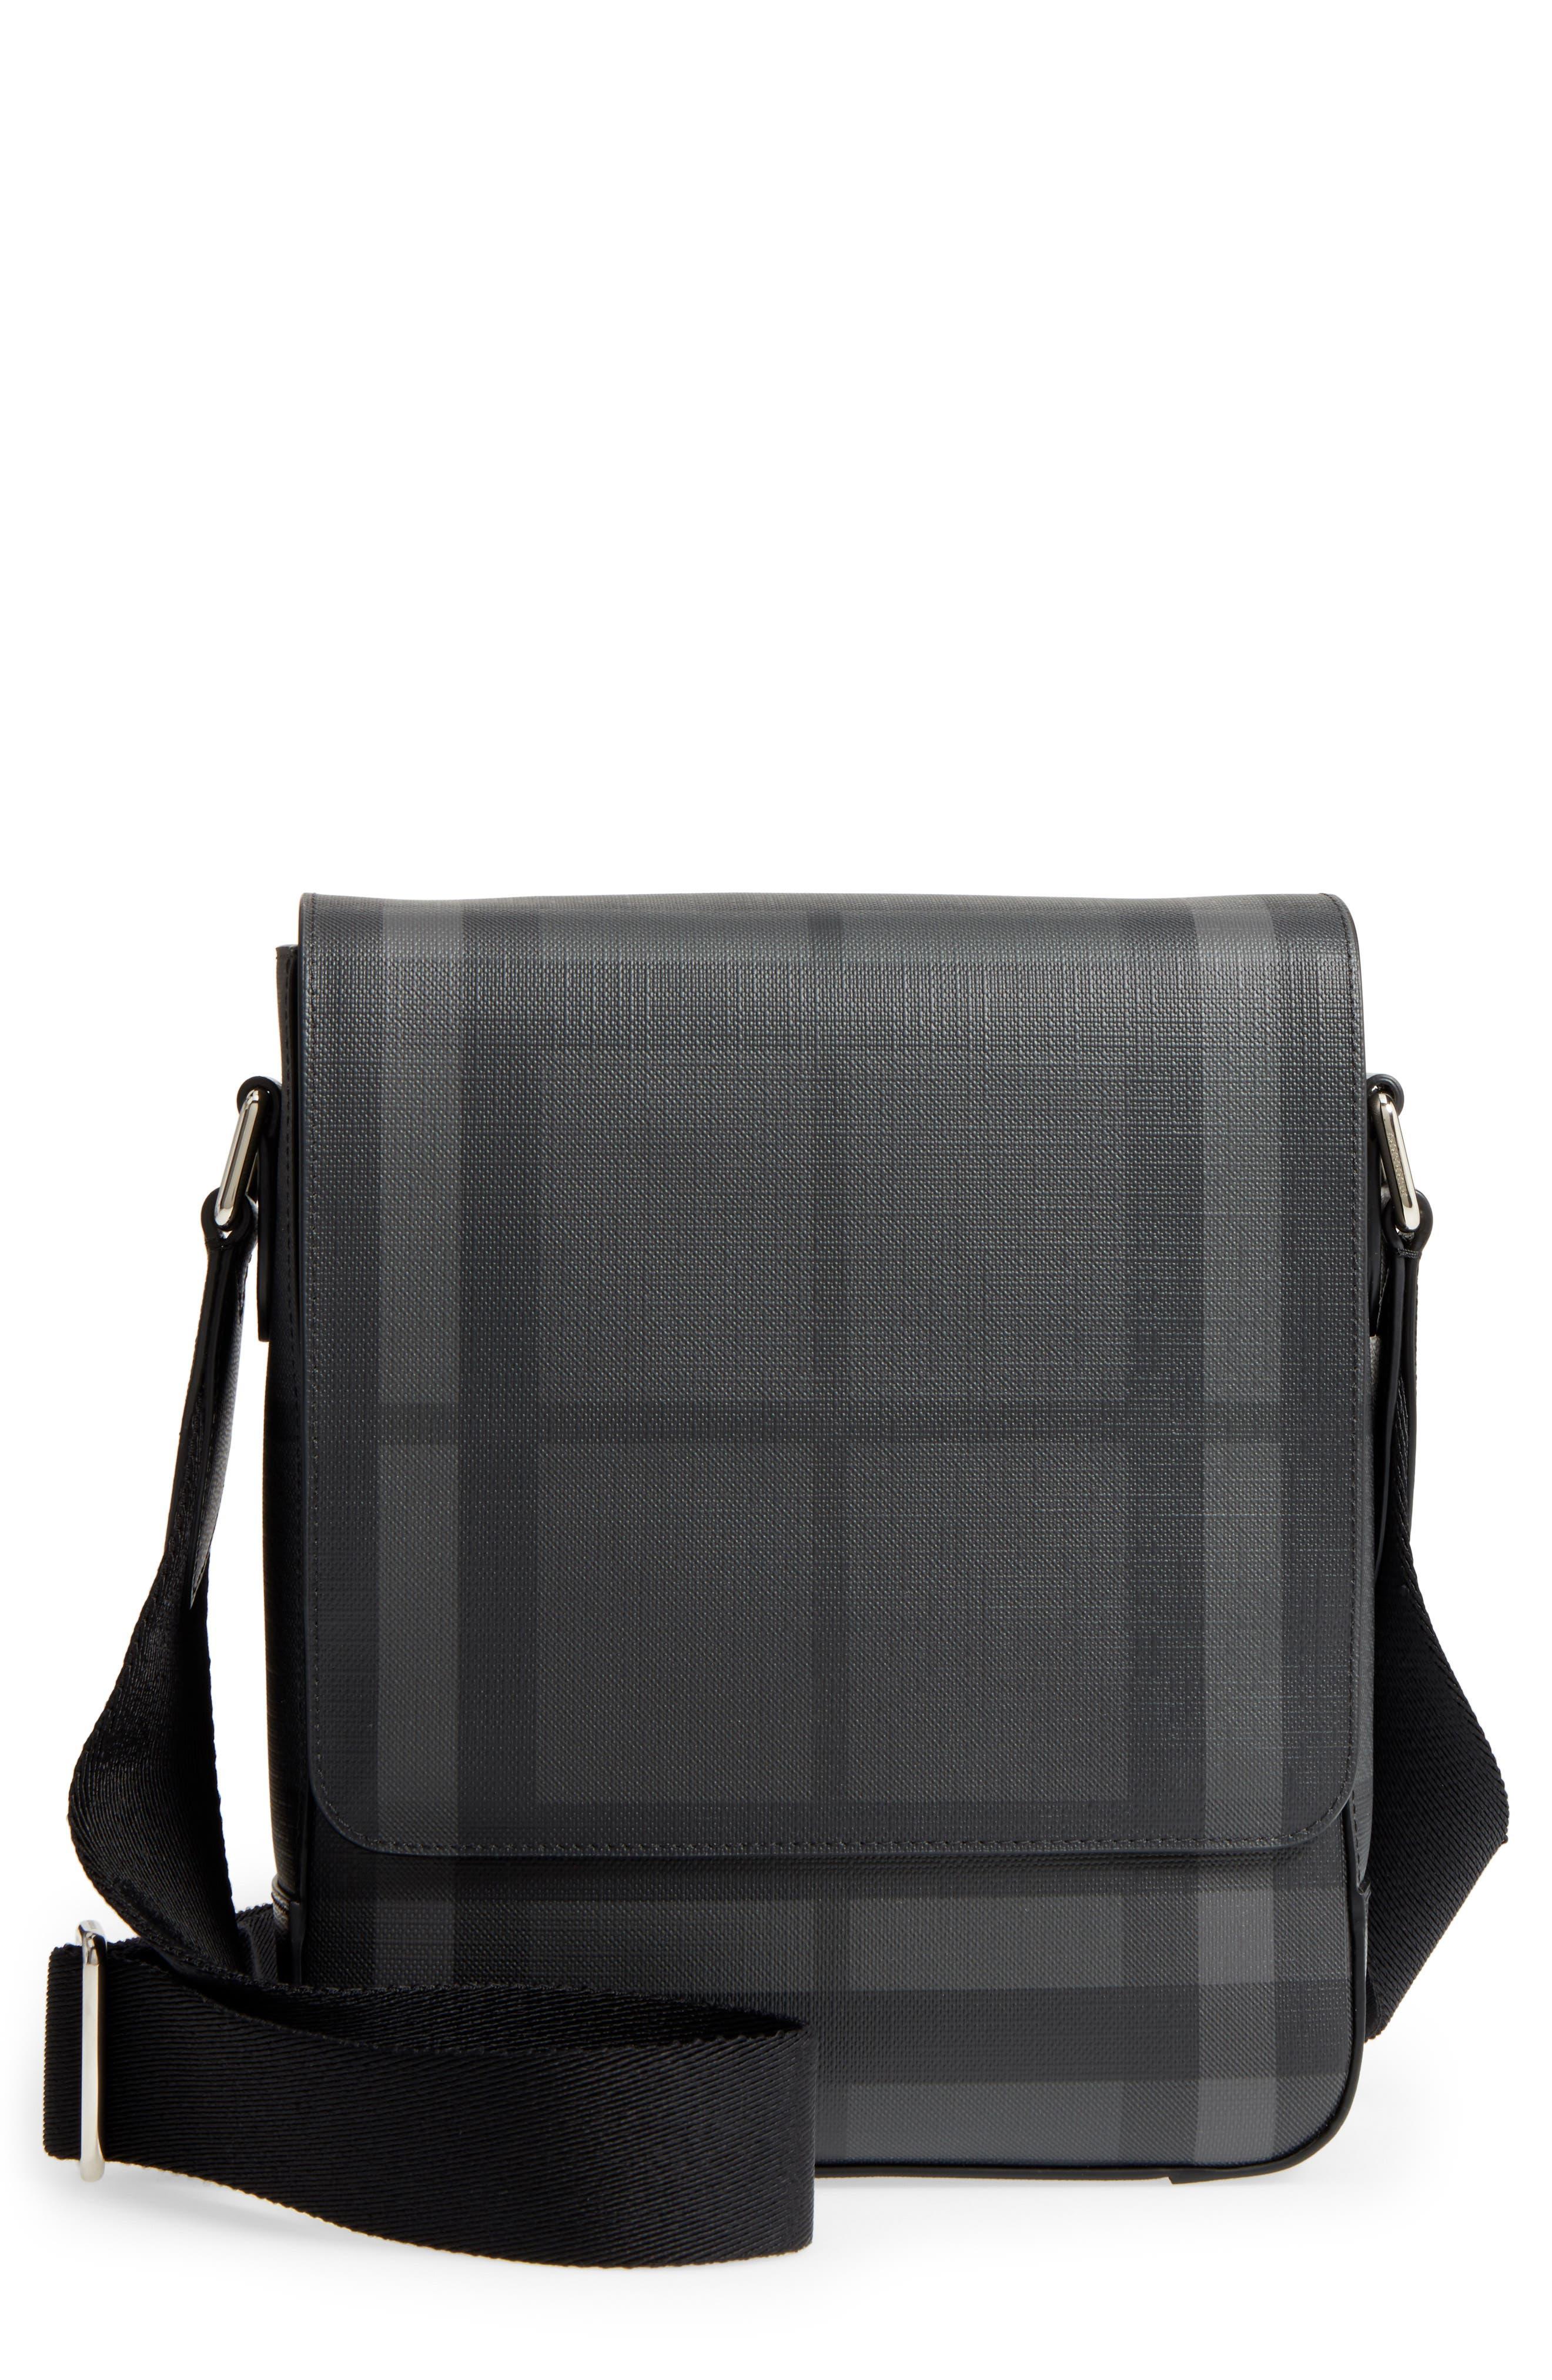 Alternate Image 1 Selected - Burberry Greenford Crossbody Bag